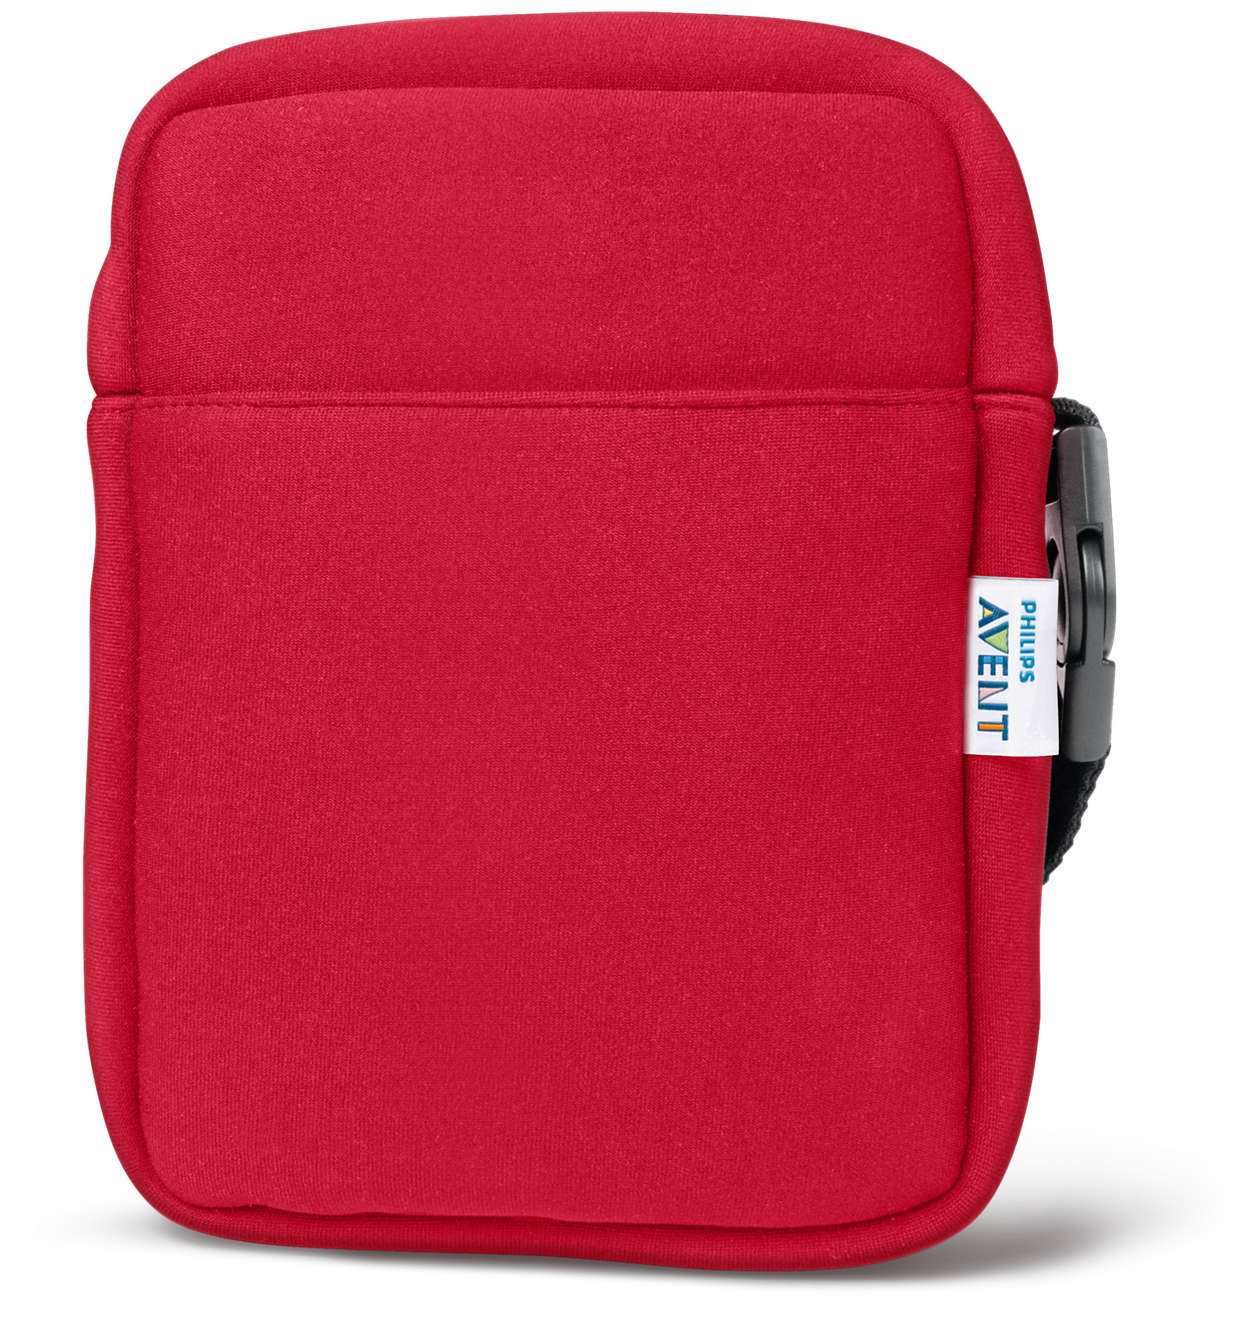 Philips Avent Thermabag Varianta: červený